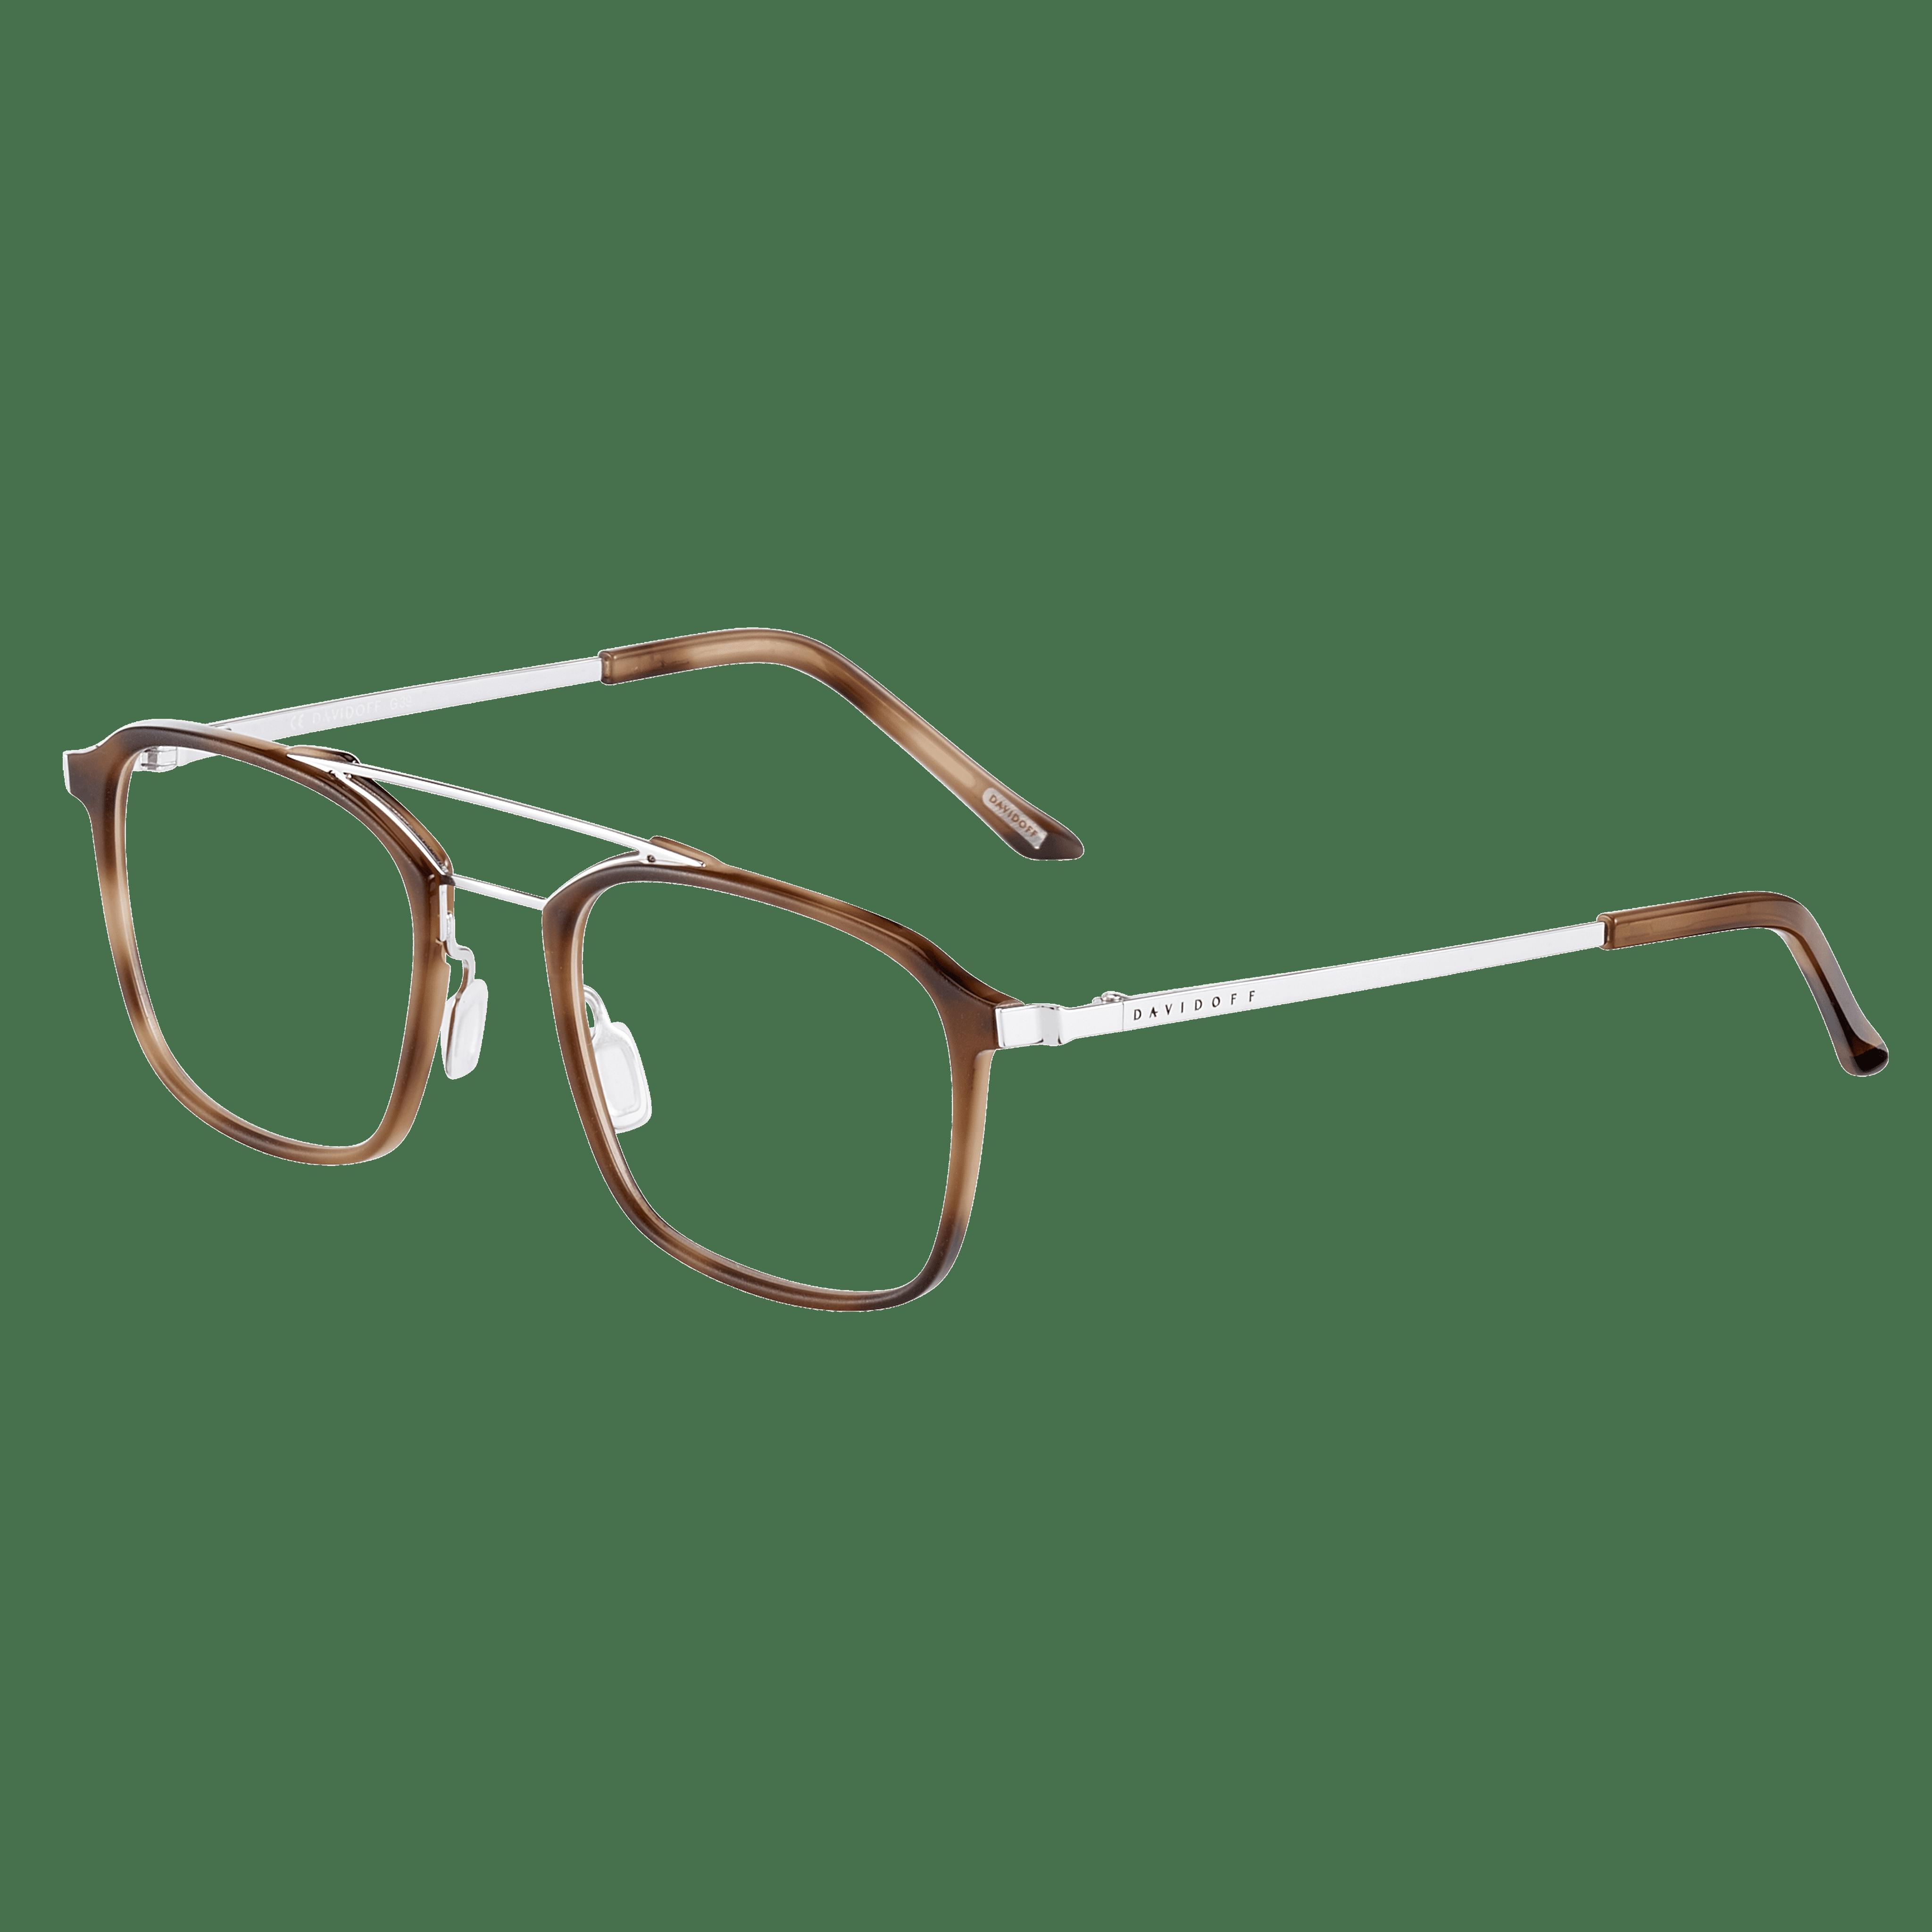 Perfect Essential – Mod. 92034 color ref. 4386